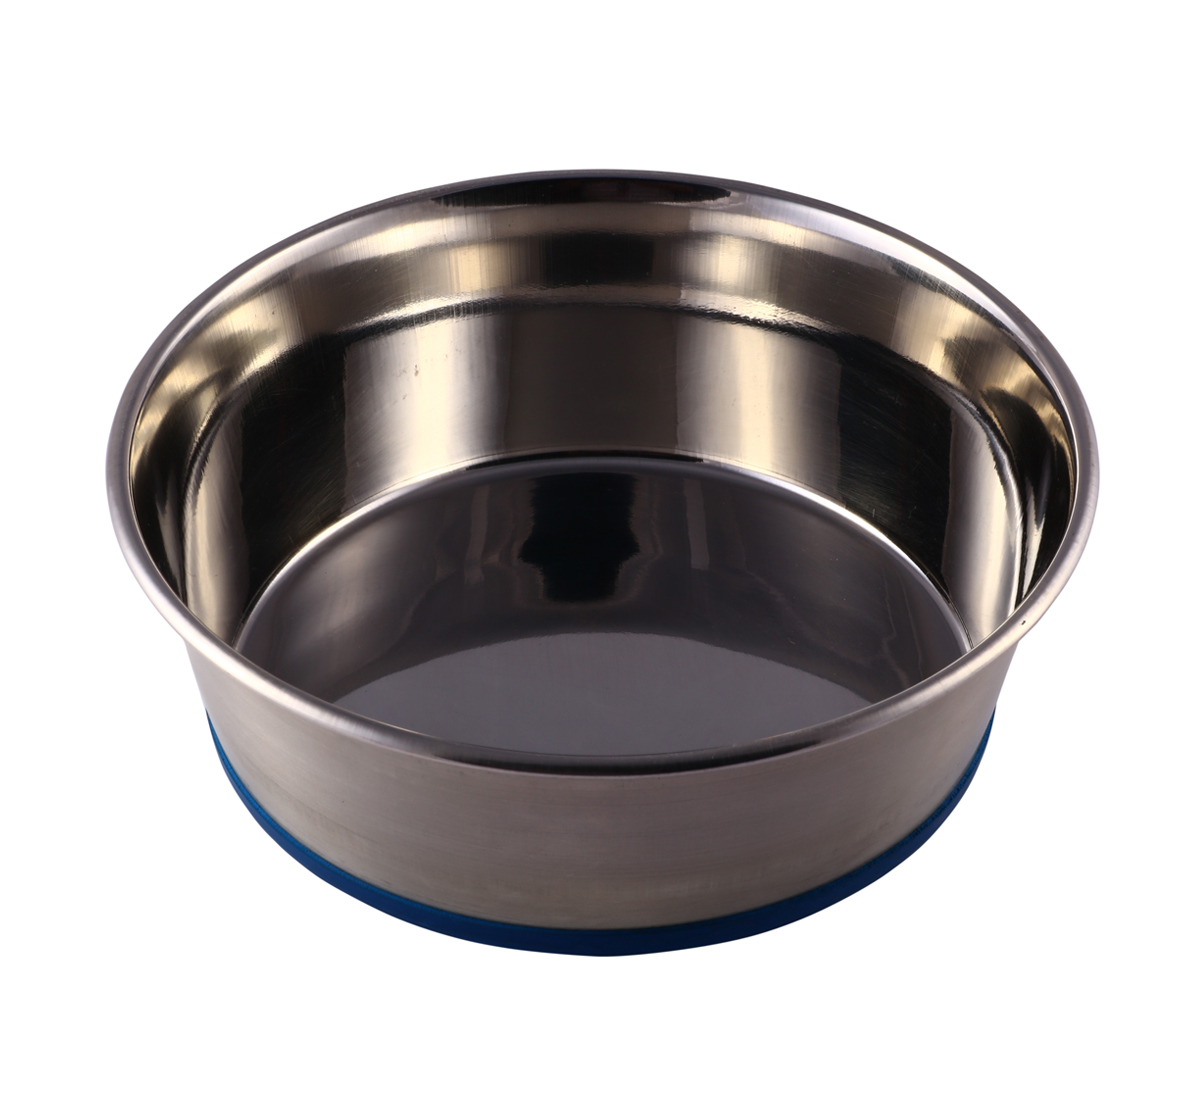 DogSpot Tip Dog Bowl -Small